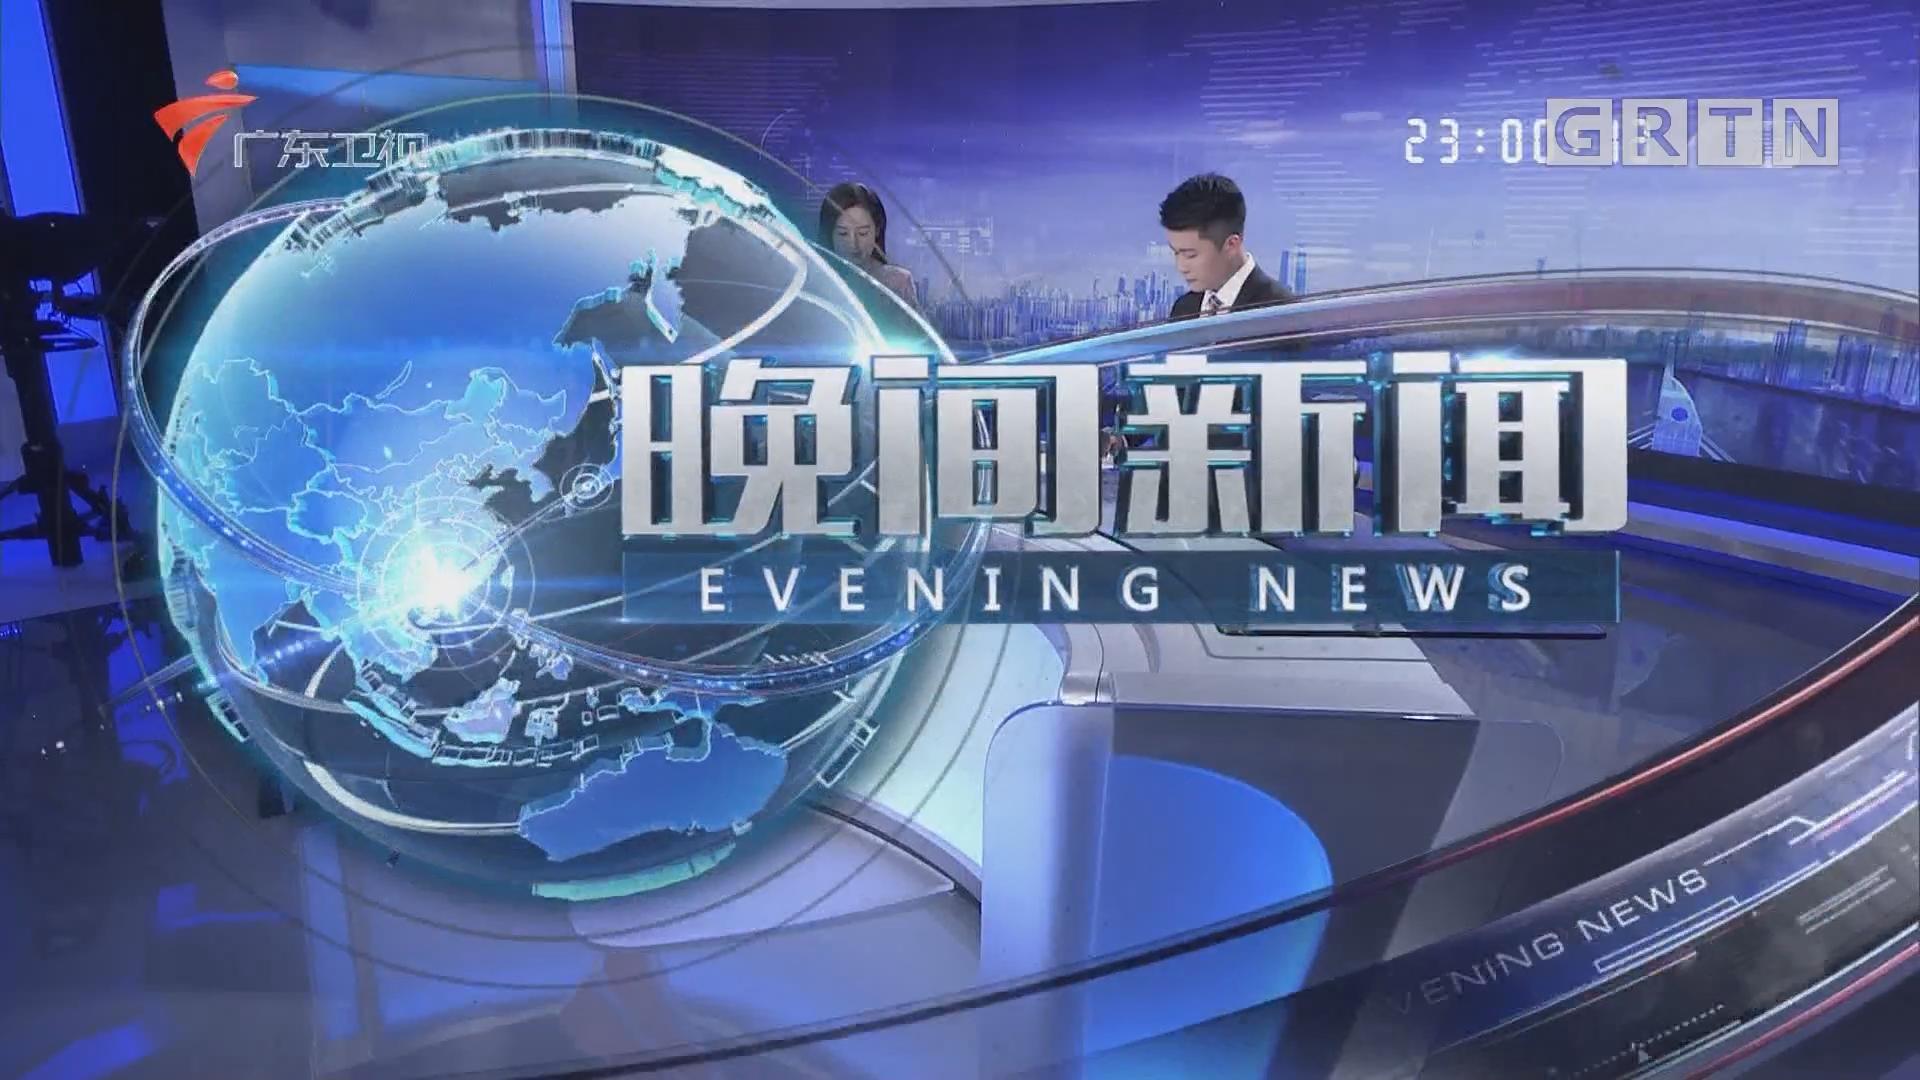 [HD][2019-08-16]晚间新闻:香港民众受够激进示威者暴行:香港年轻人被怂恿 给钱参加示威